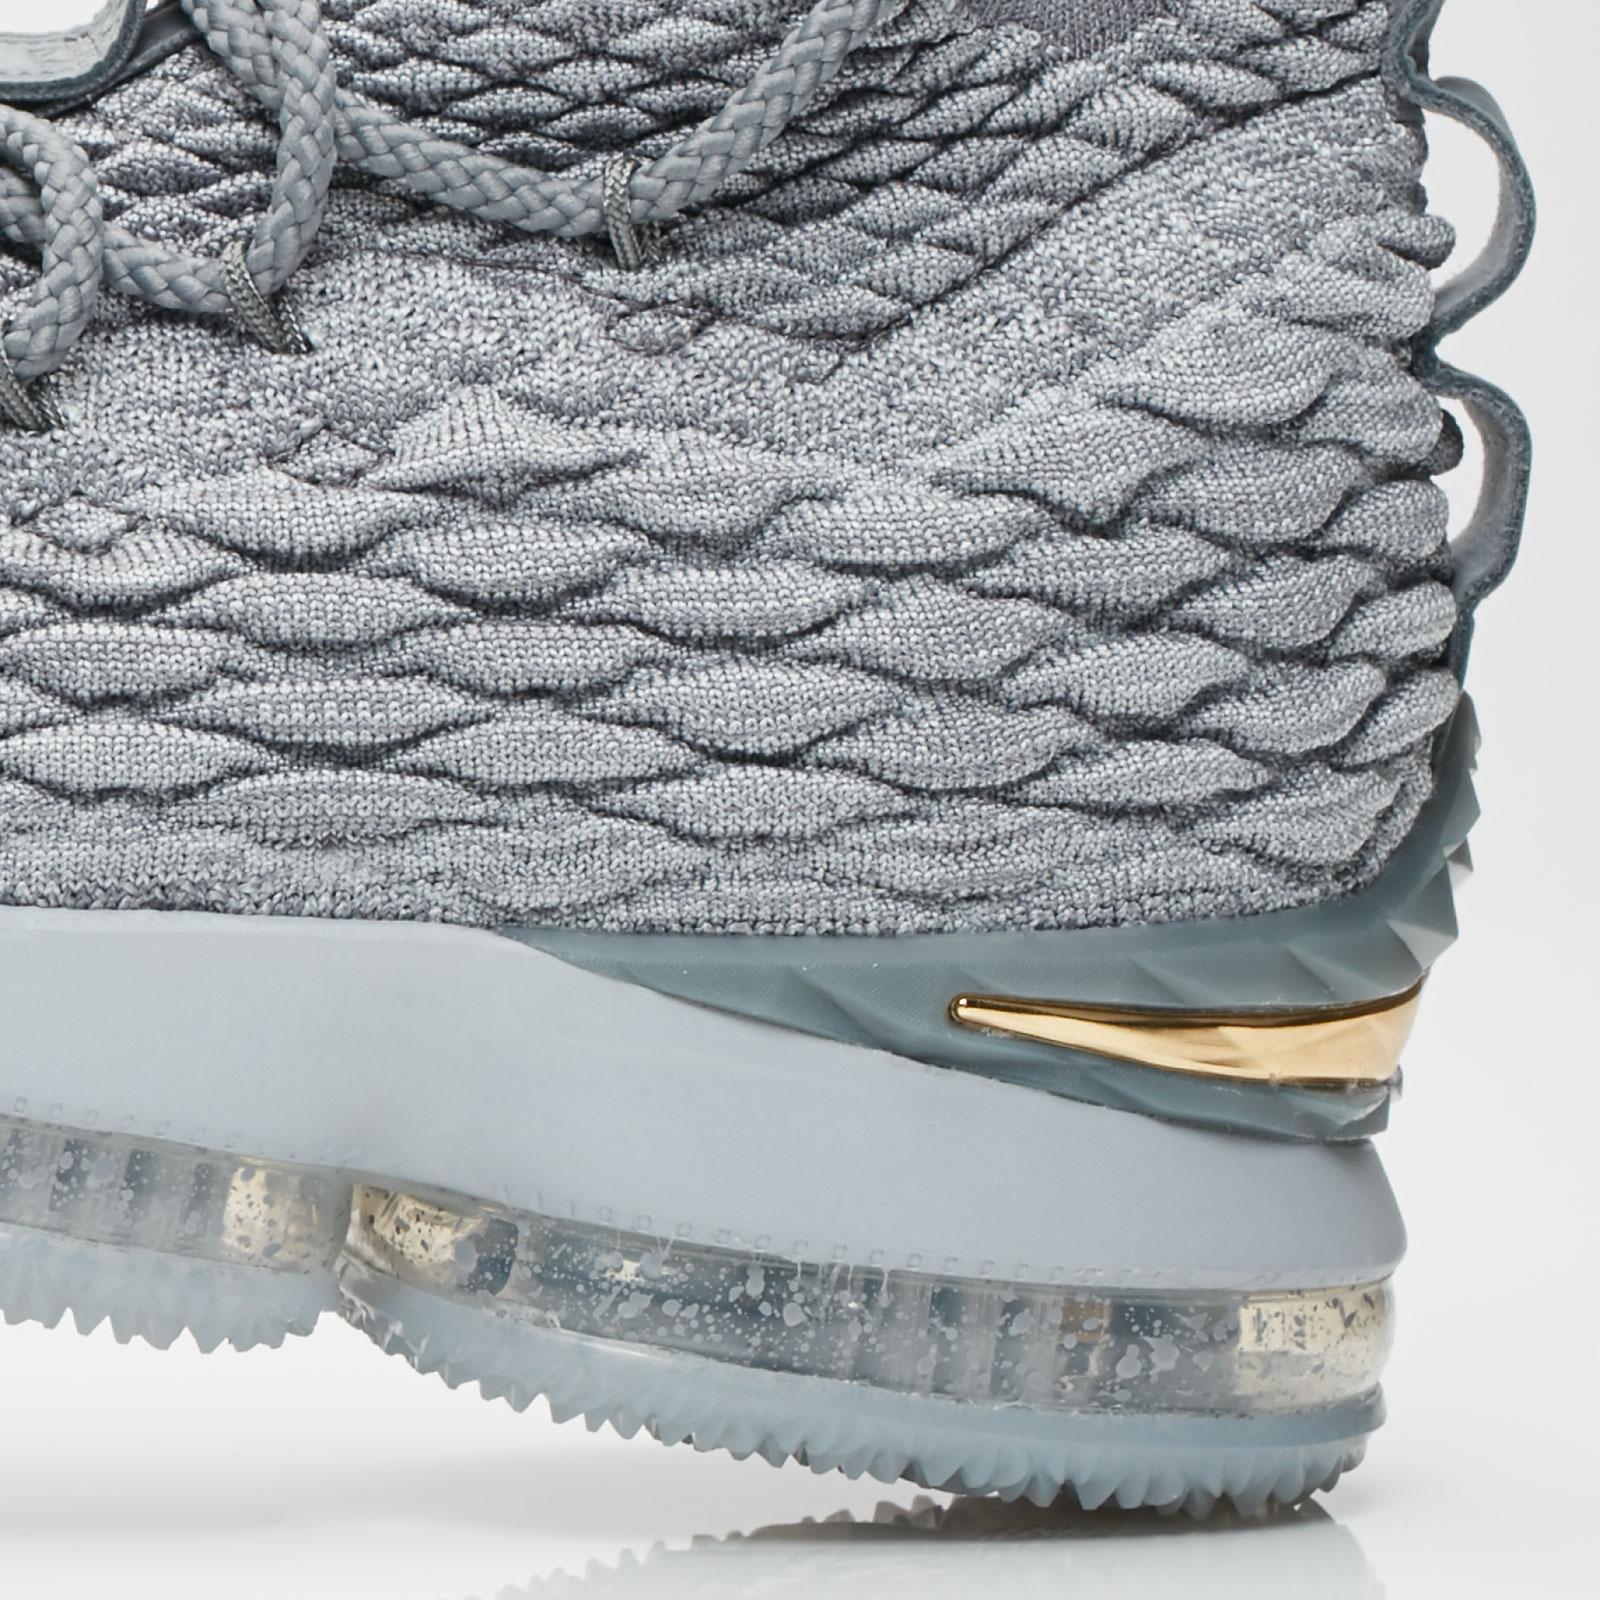 ee36e3bd3eb Nike Lebron XV - 897648-005 - Sneakersnstuff